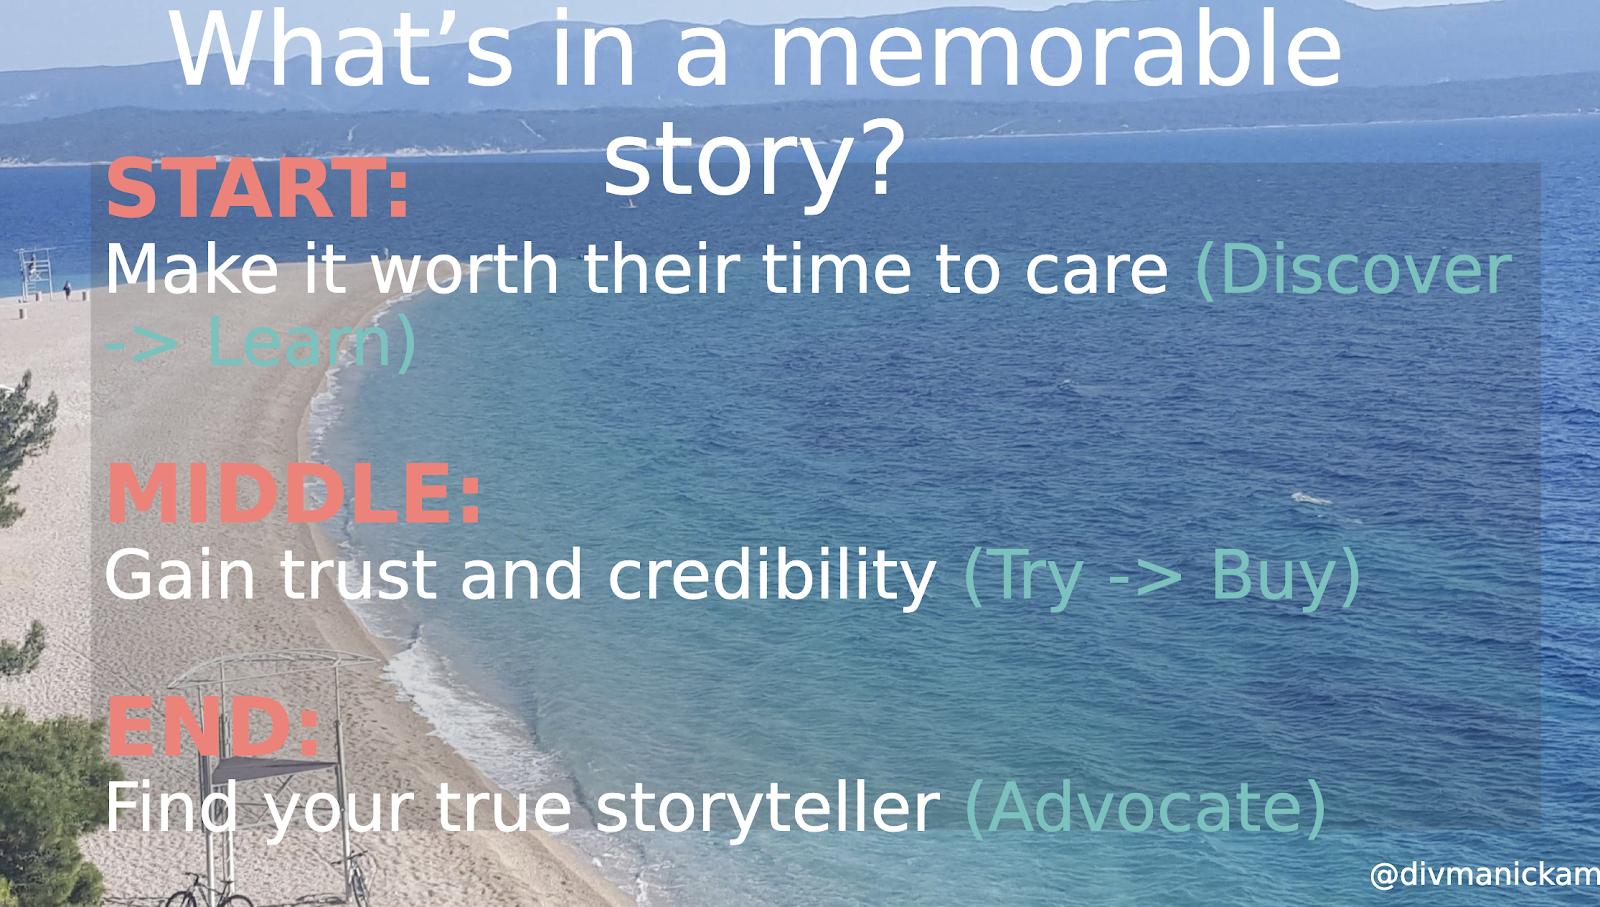 A breakdown of a memorable story.